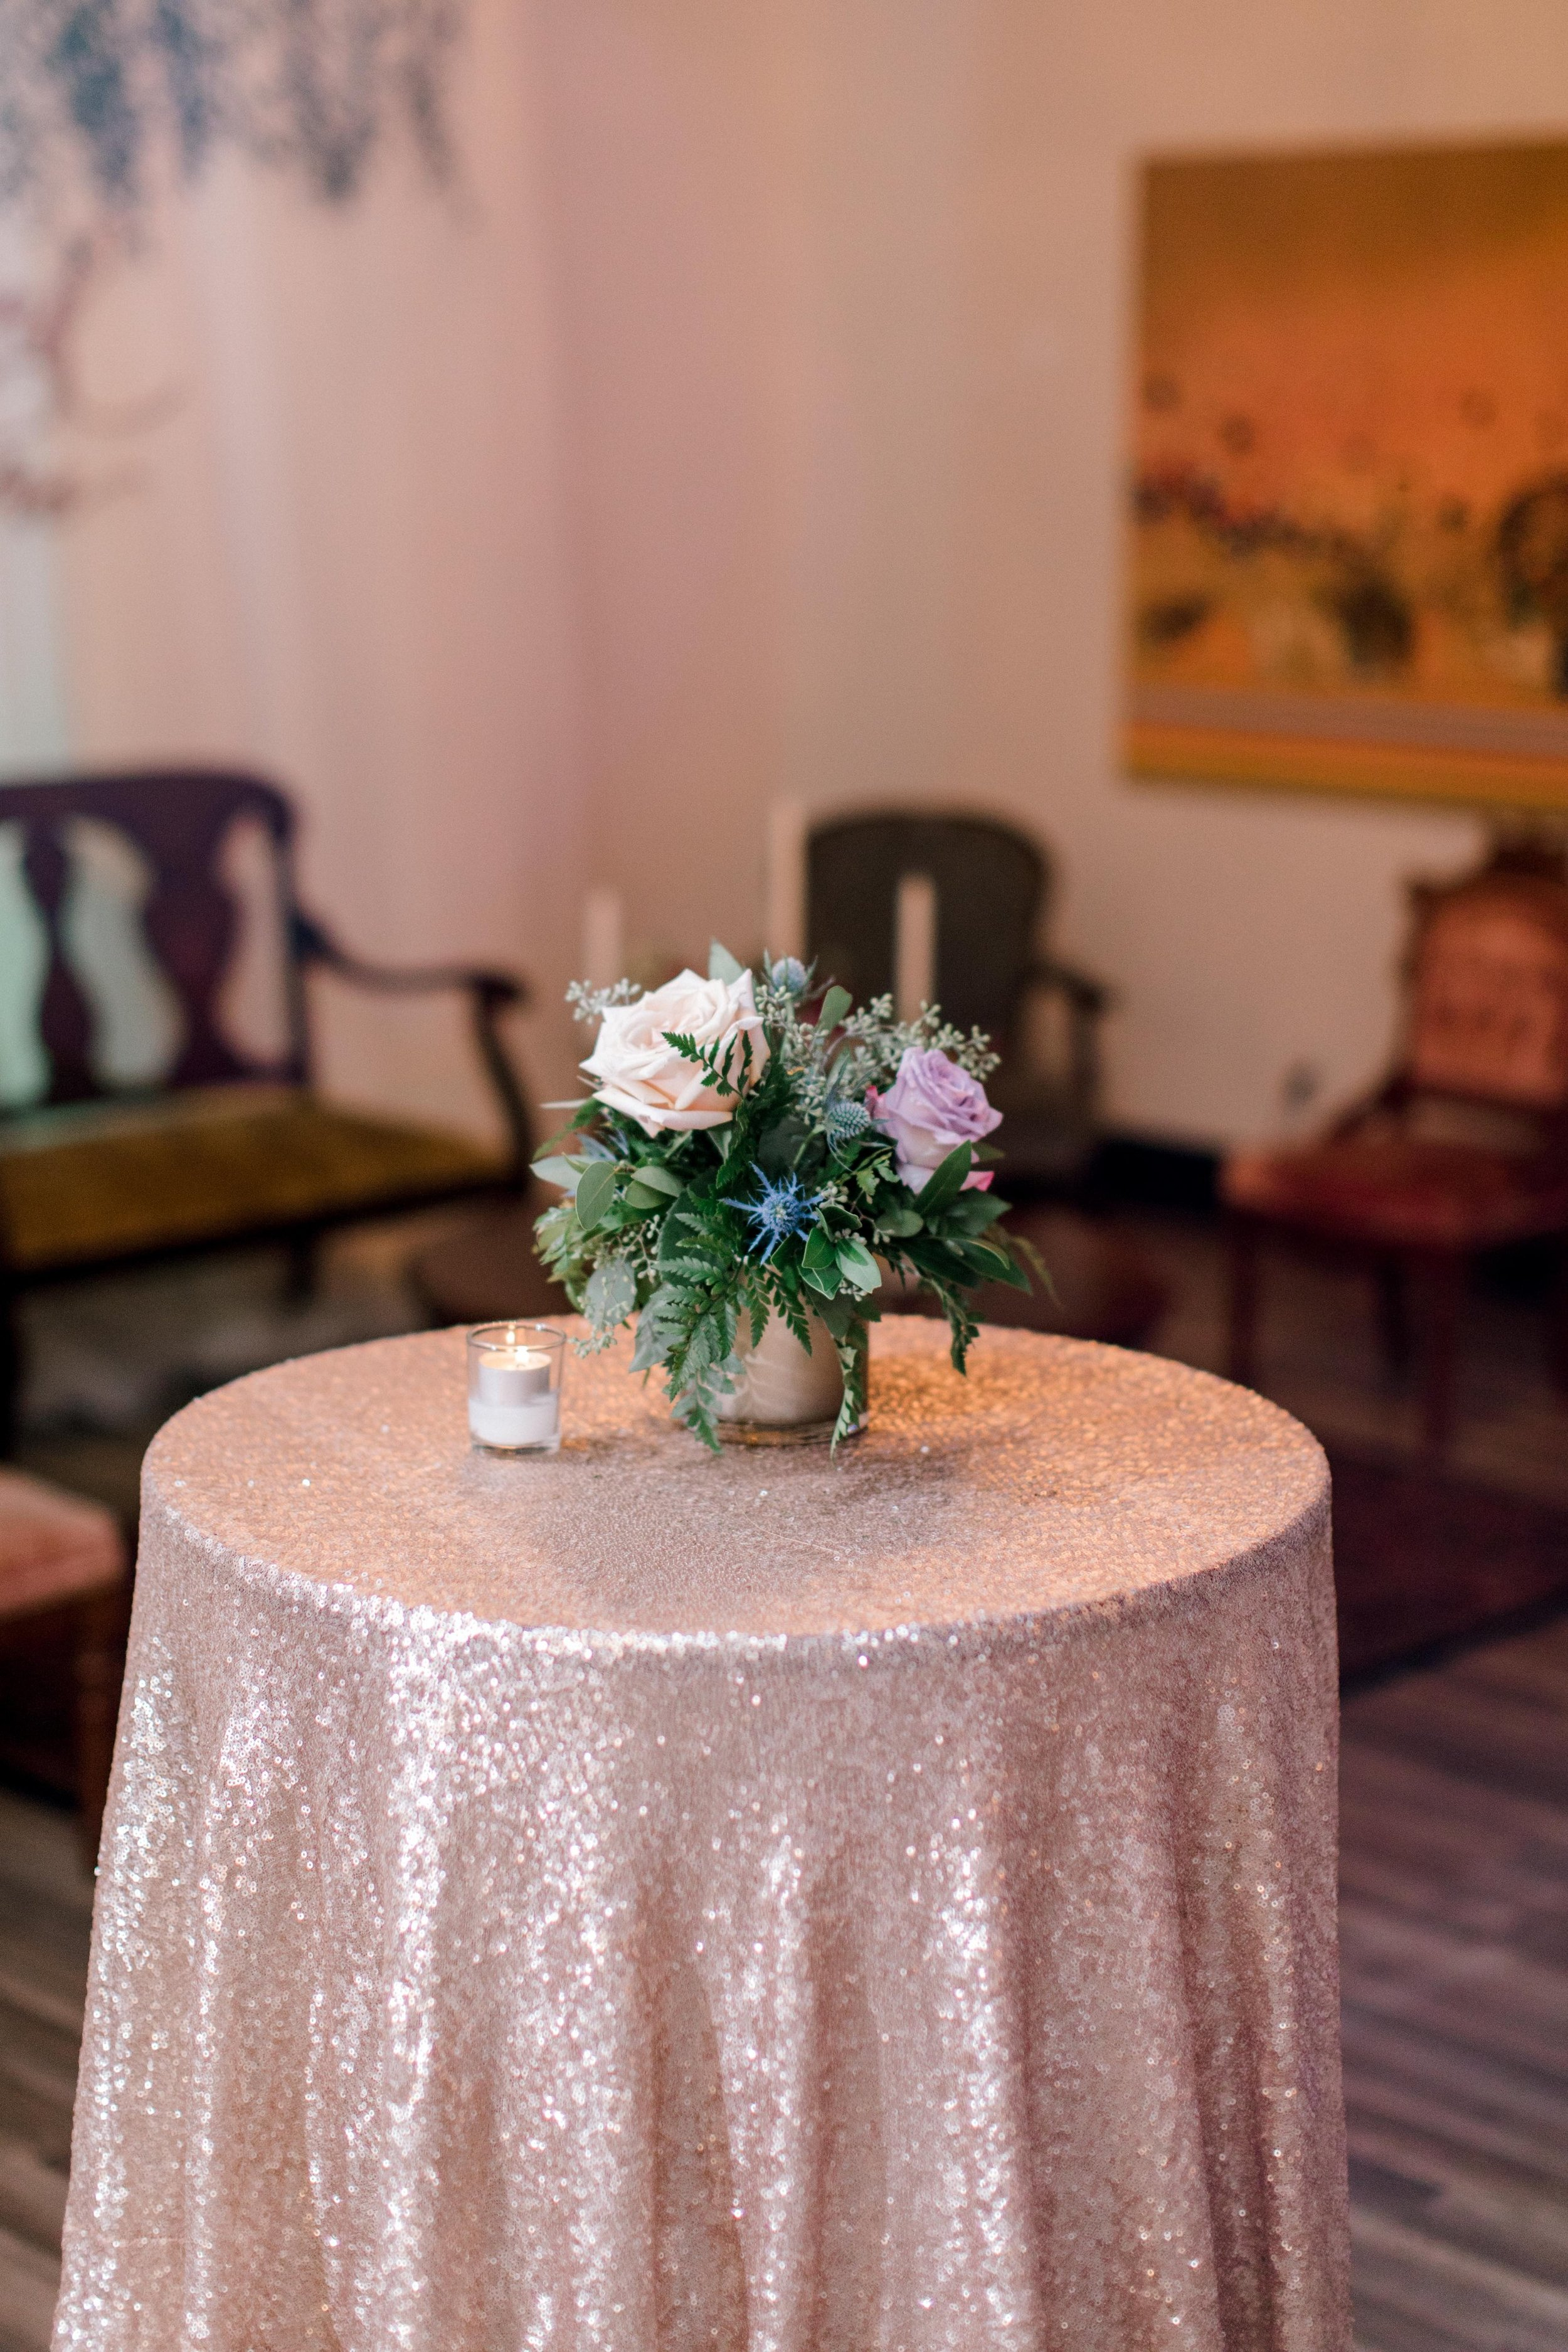 Ryan Alexa Married-Reception-0051.jpg